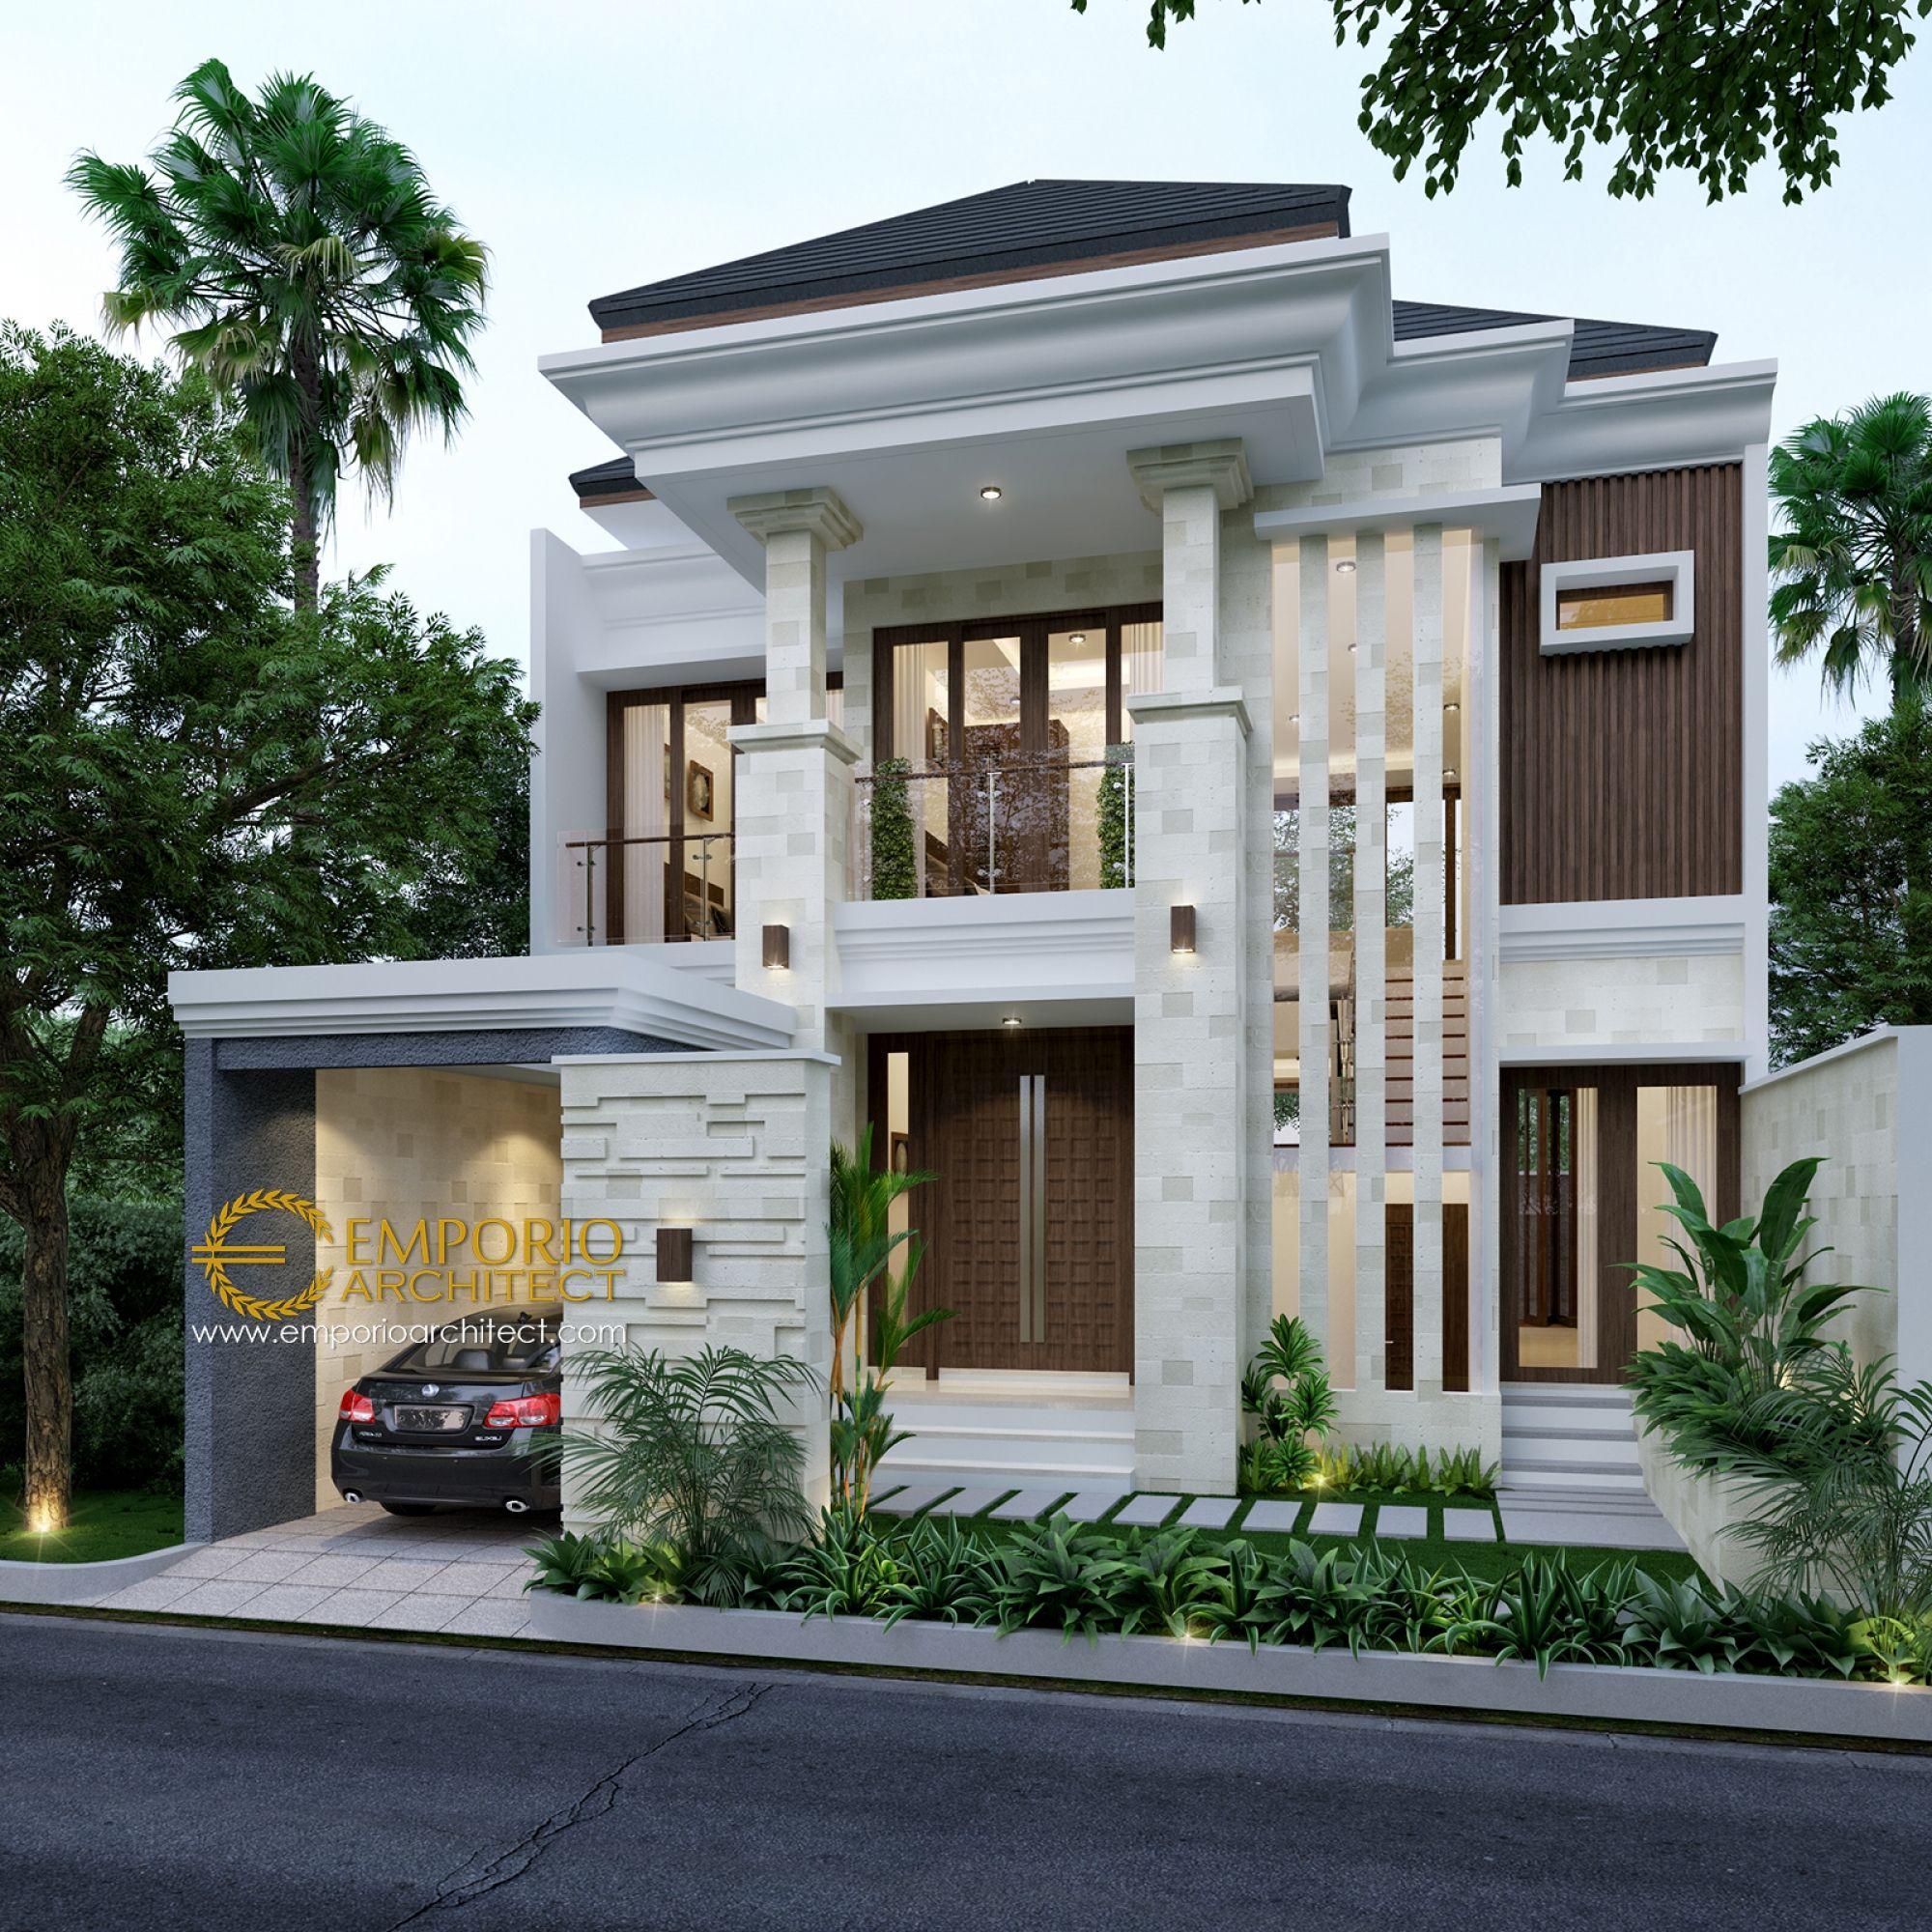 Jasa Arsitek Karawang Jawa Barat Desain Rumah Bapak Norman